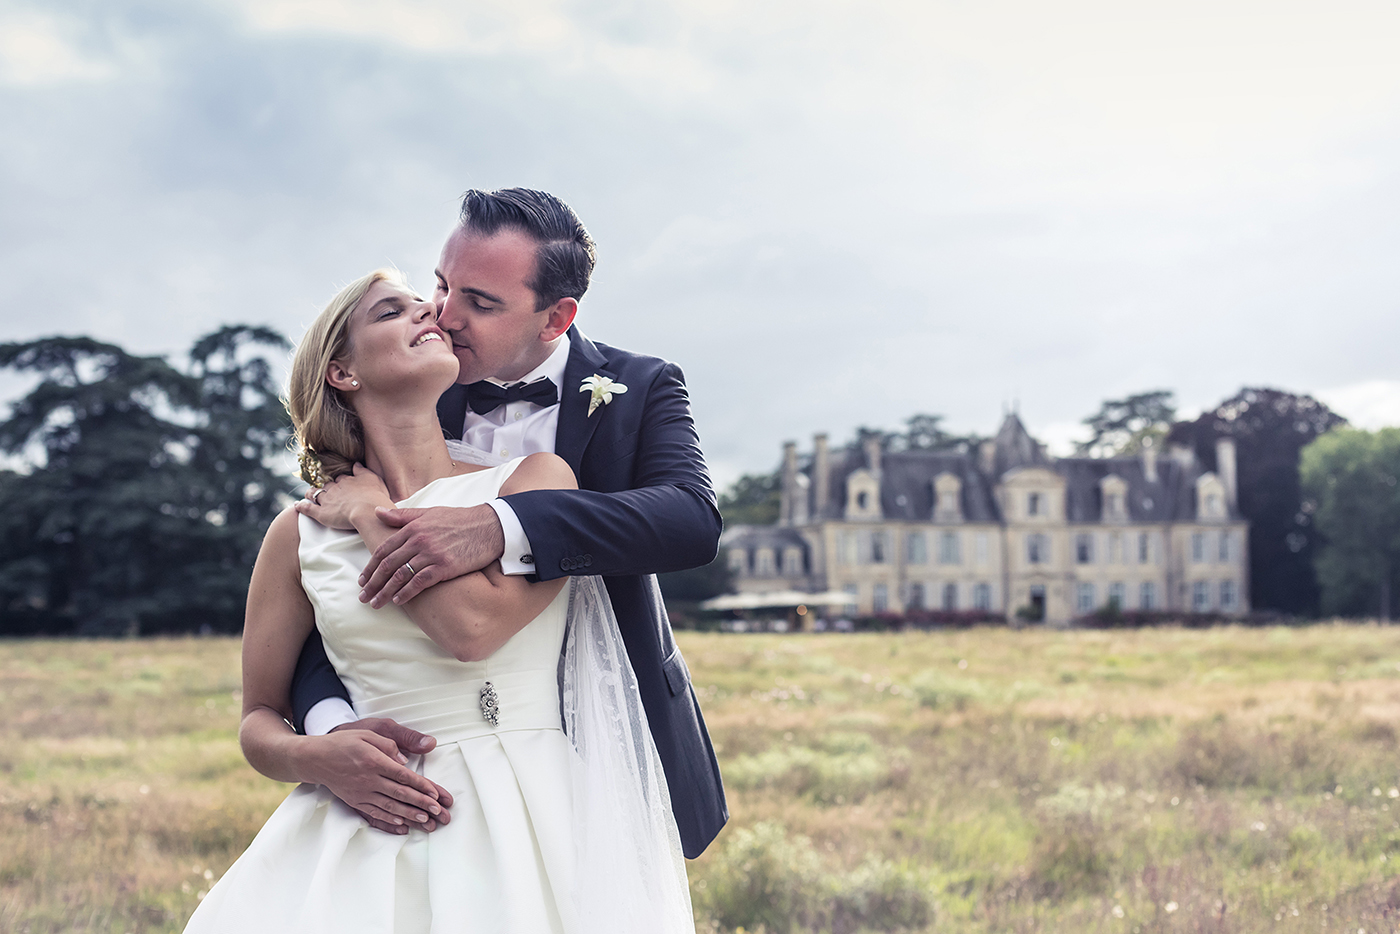 Photographe-mariage-couple-guillaume-heraud-07R